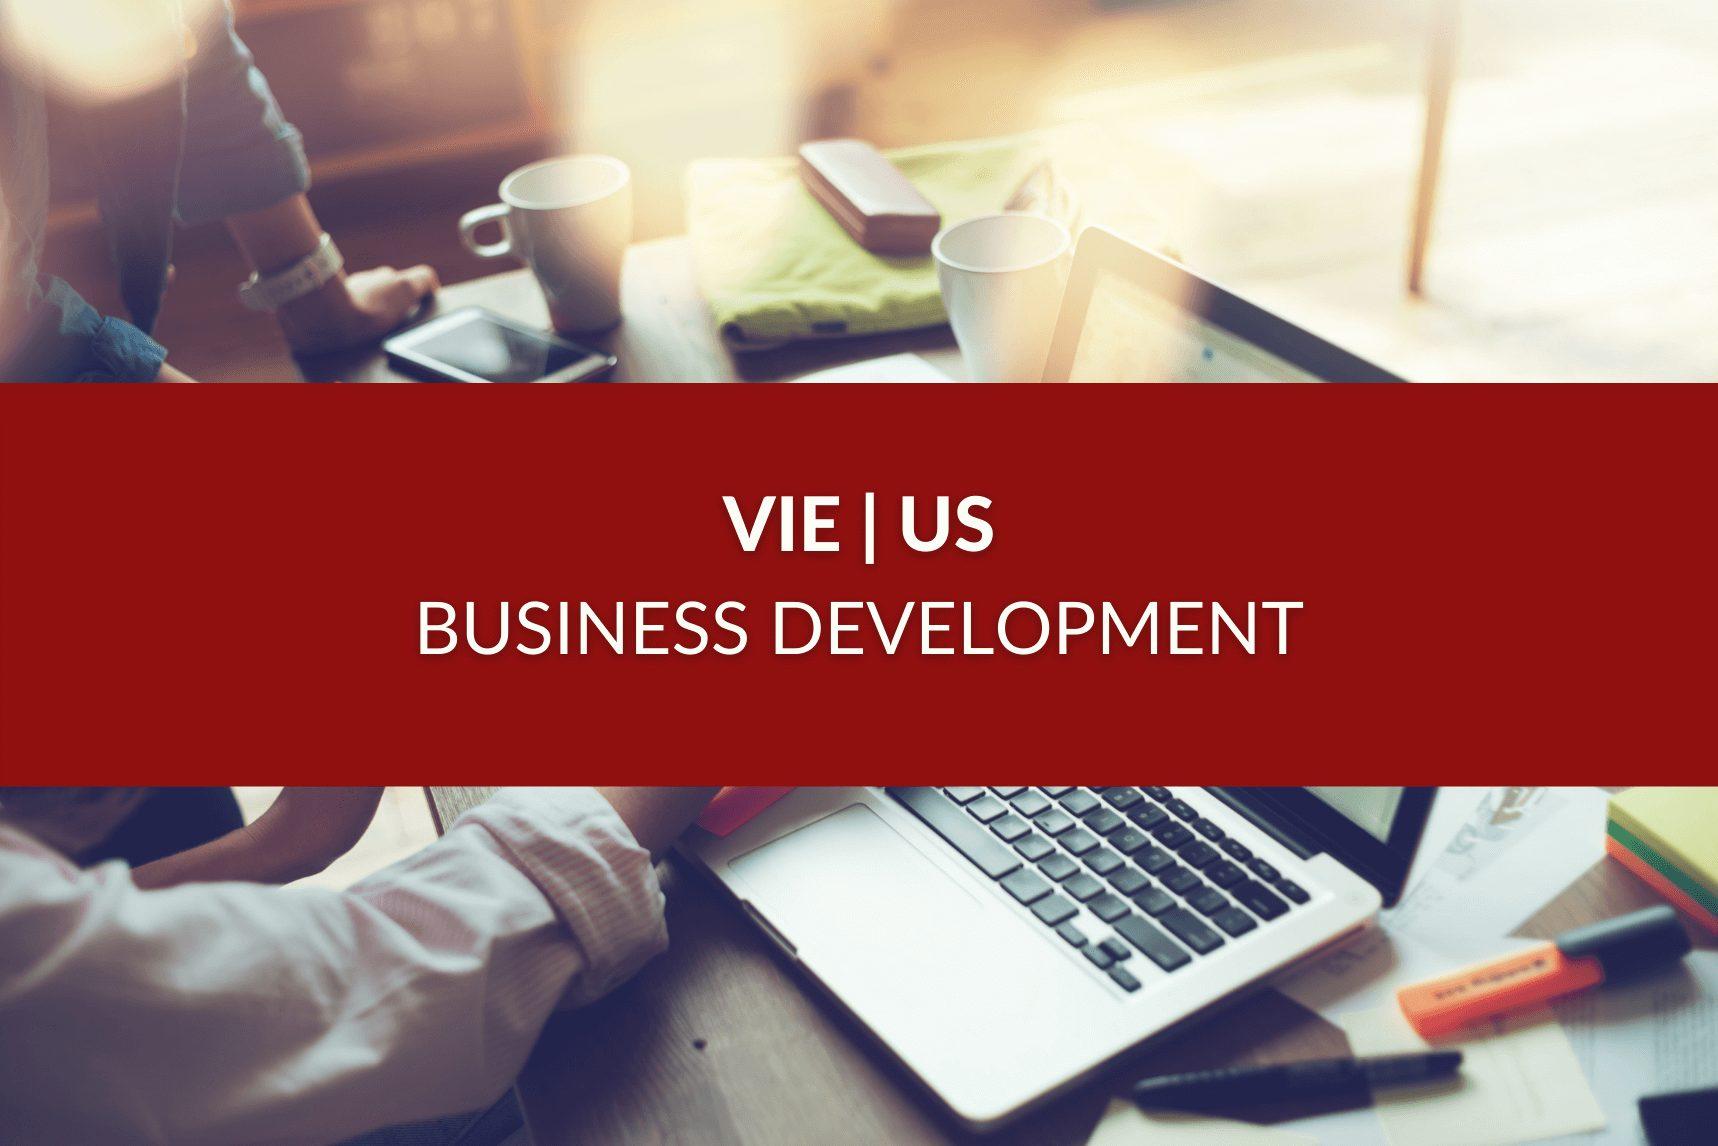 VIE BUSINESS DEVELOPMENT USA